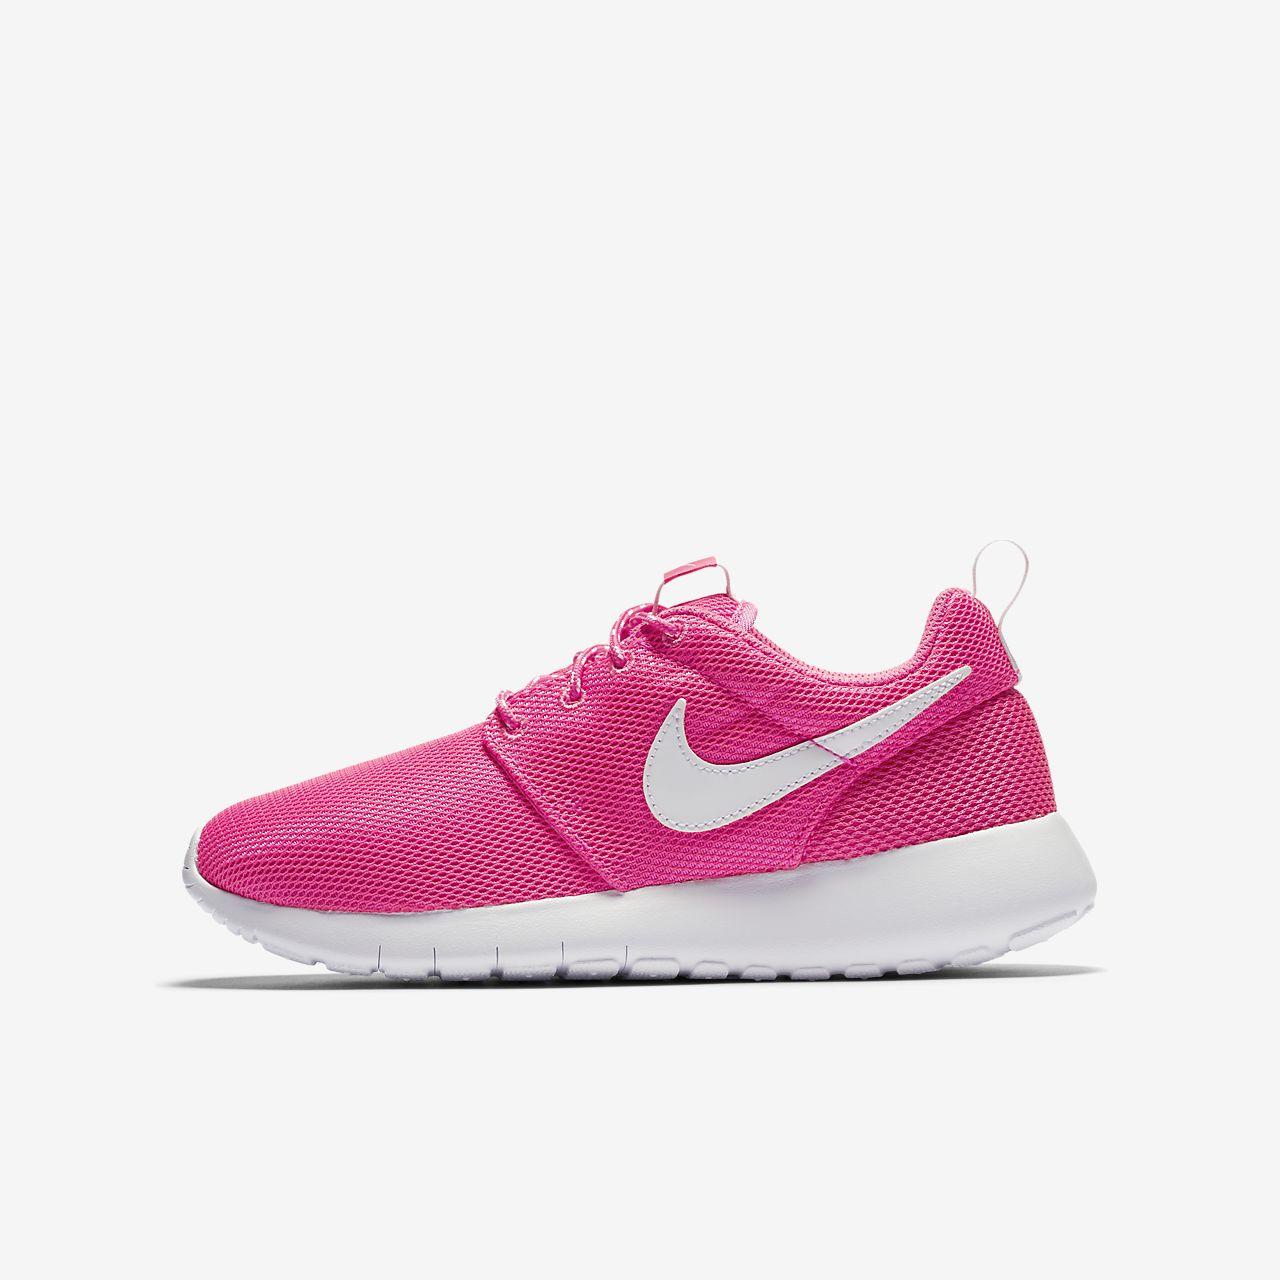 9dab31a8f102e Chaussure Nike Roshe One pour Enfant plus âgé. Nike.com CA